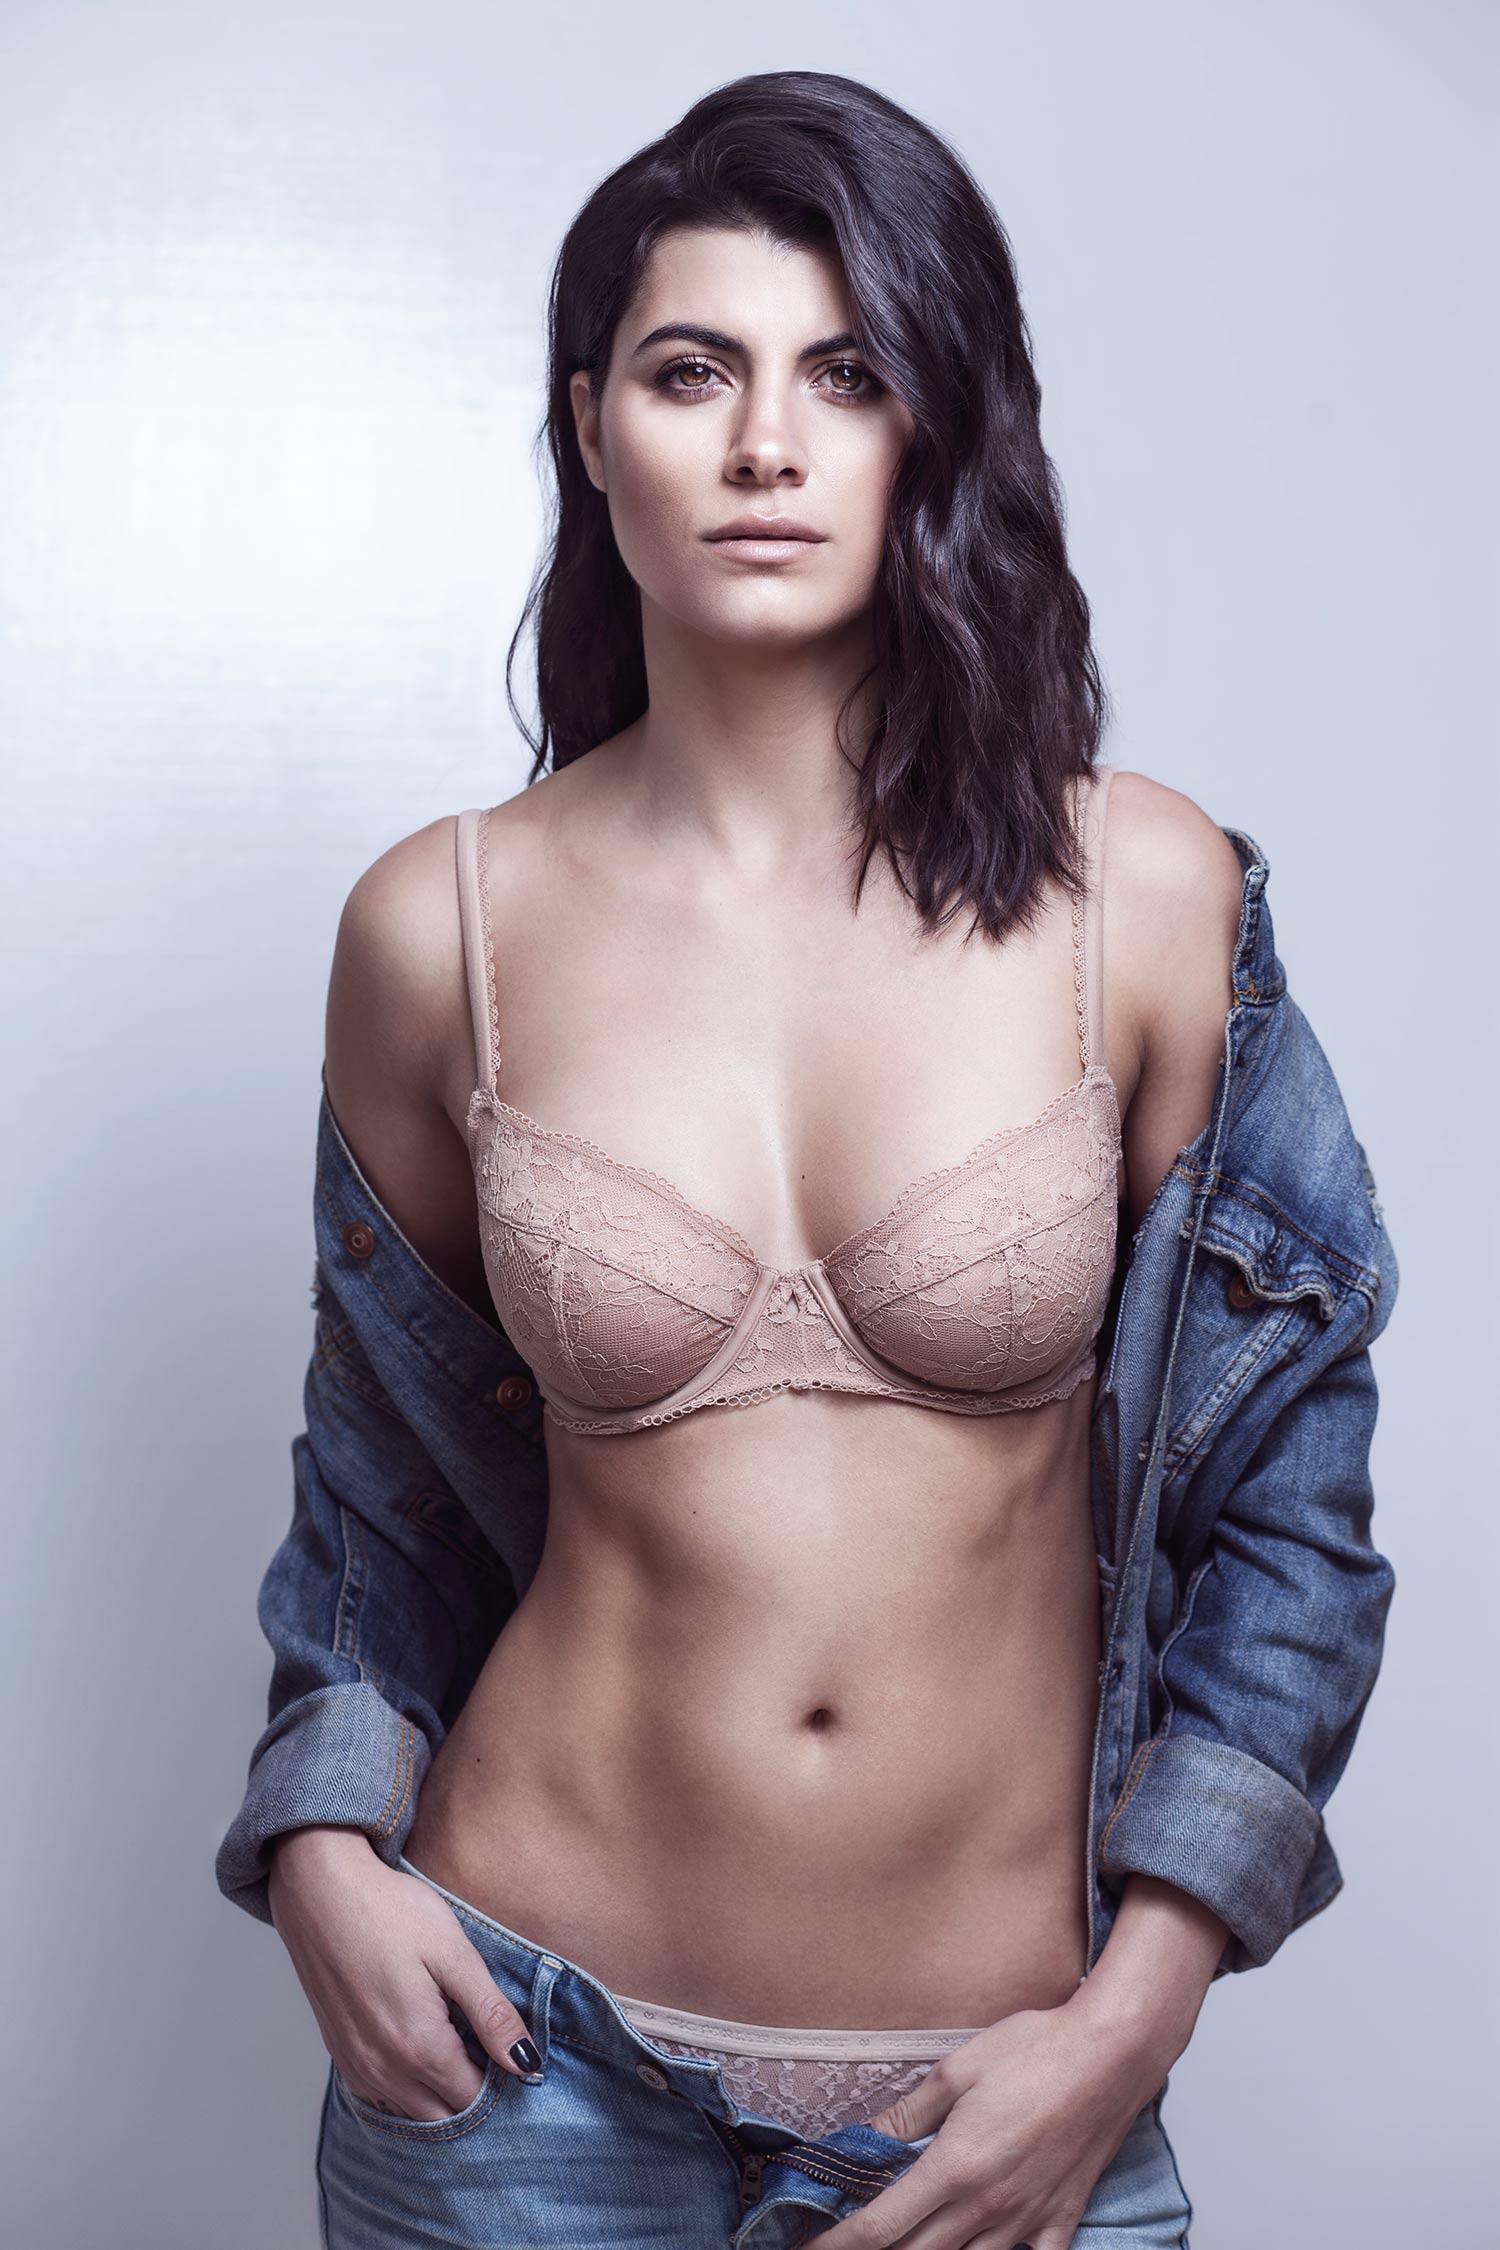 stephanie-in-underwear-photography-by-sissela